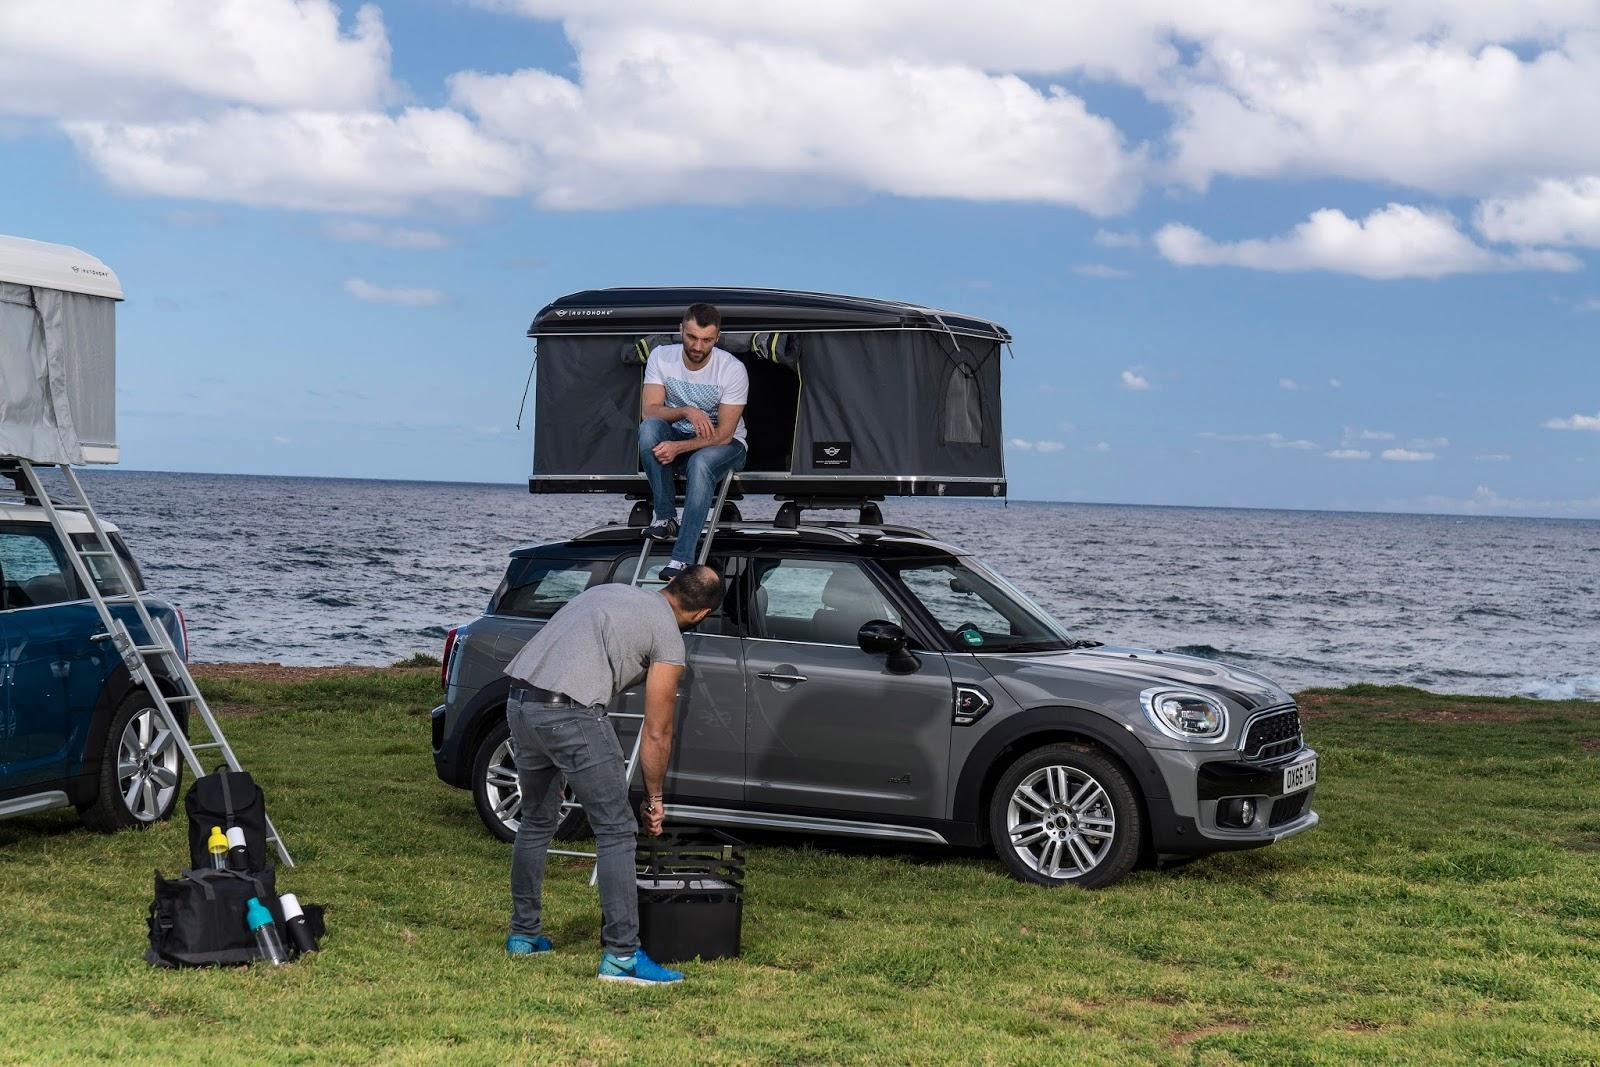 P90258004 highRes the autohome roof te Το MINI Countryman έχει και... σκηνή οροφής Mini, MINI Cooper Countryman, SUV